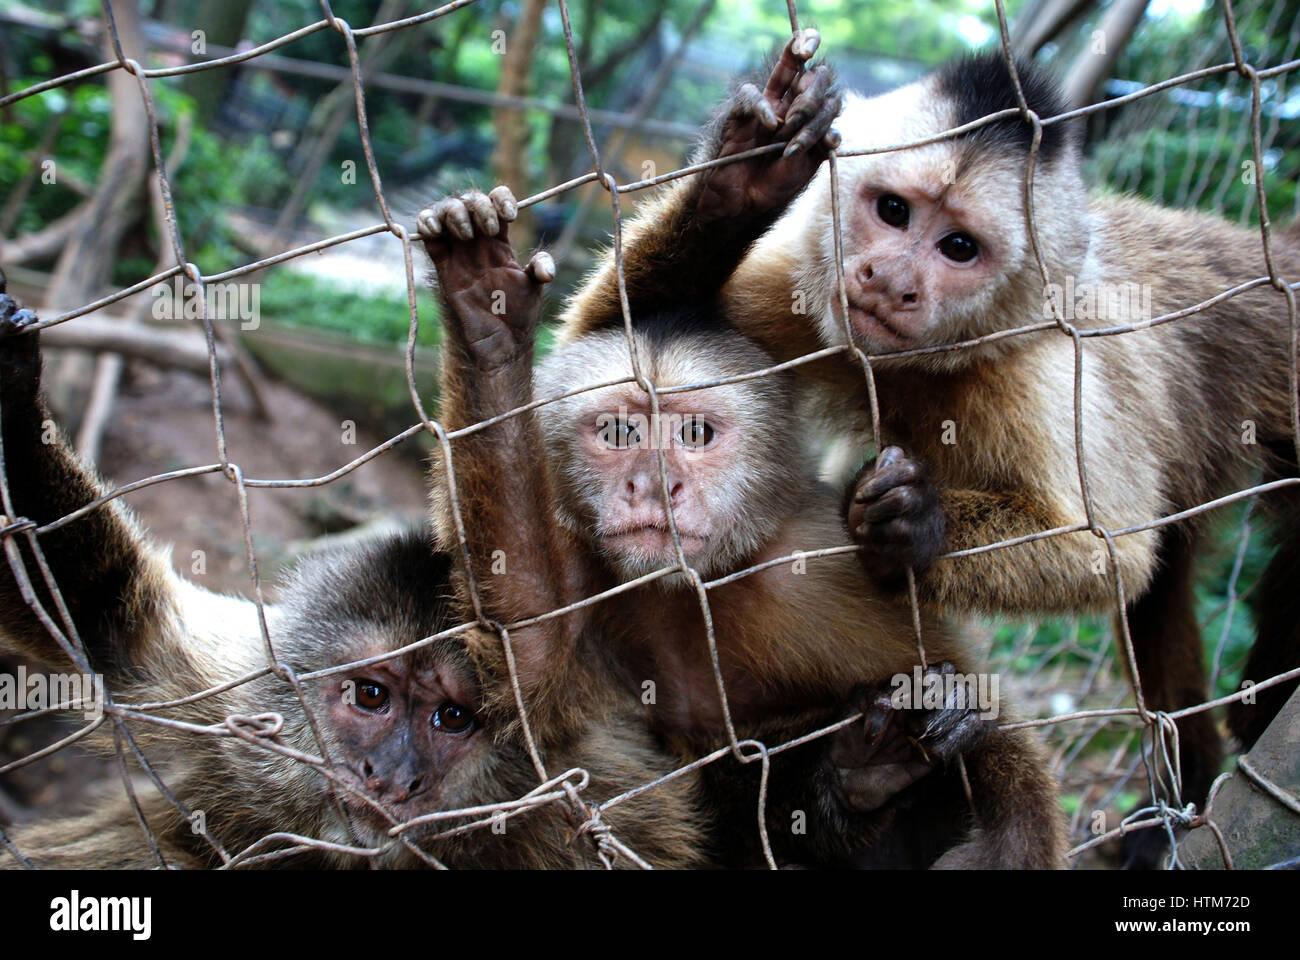 Capuchin monkeys in a zoo, Venezuela. - Stock Image